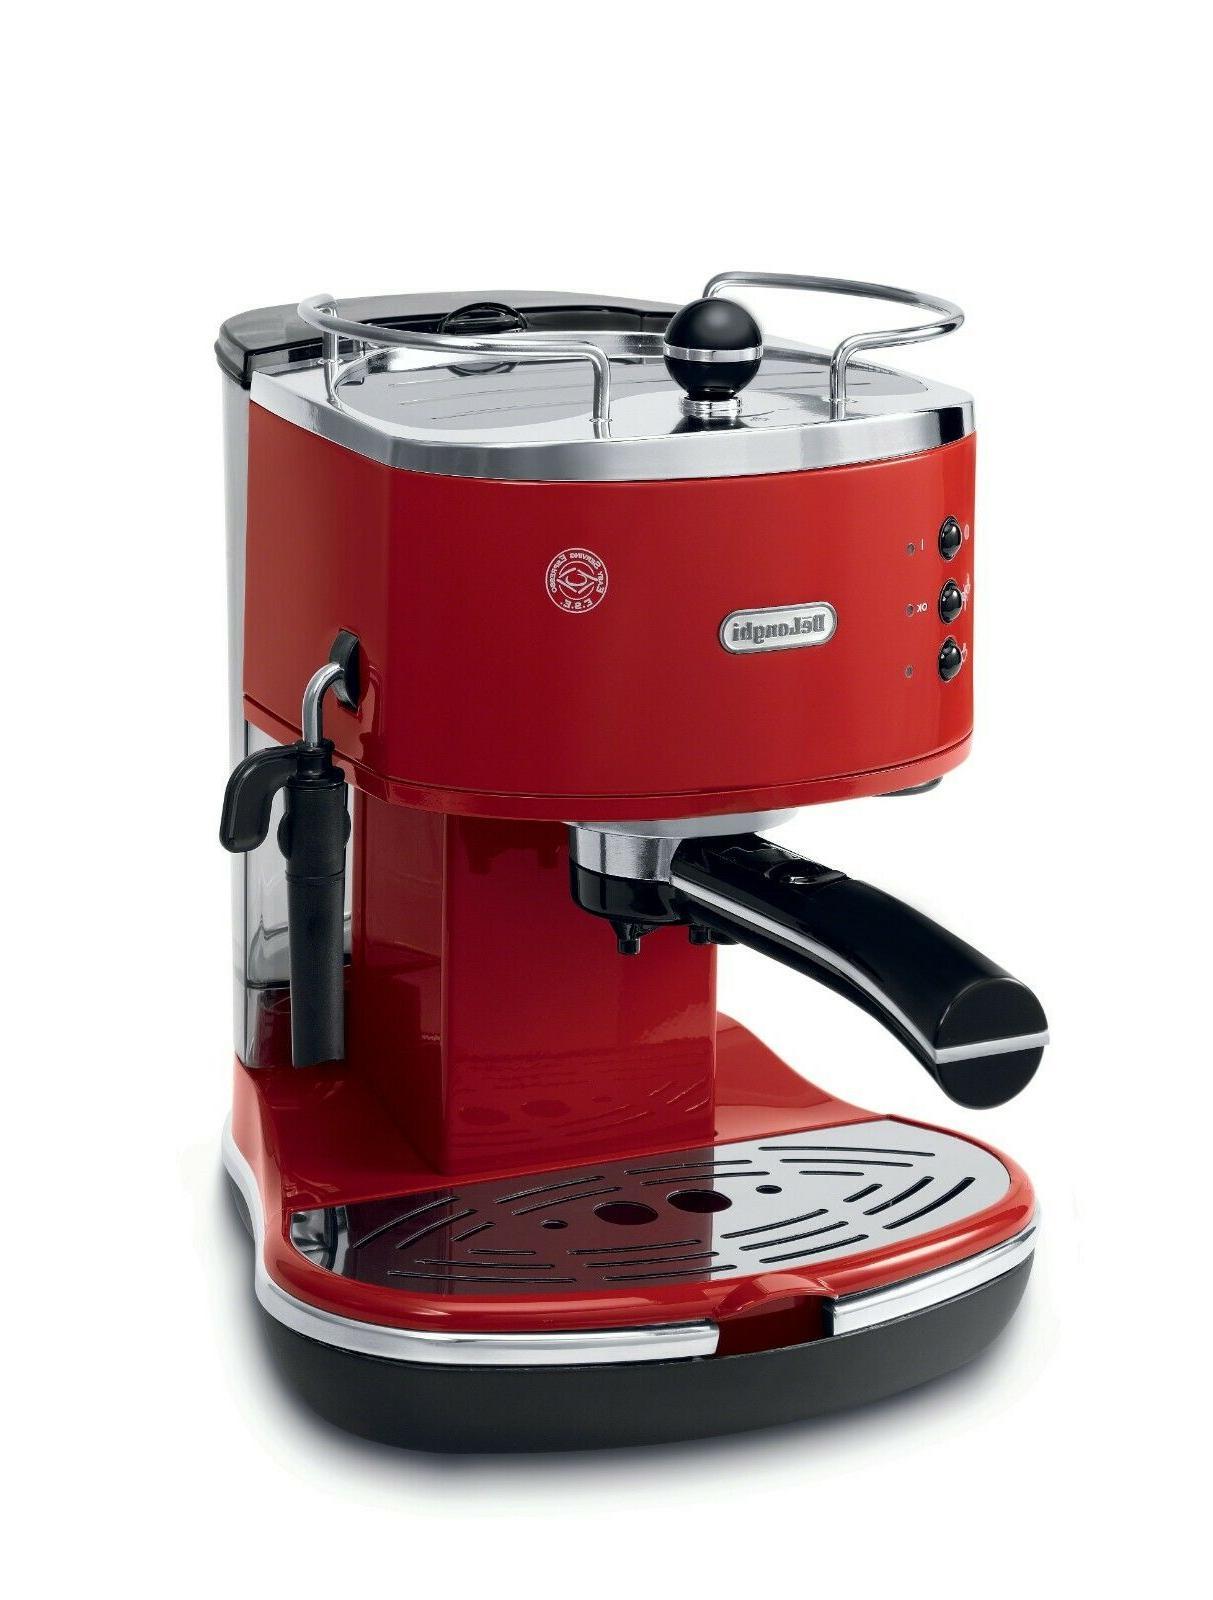 Delonghi - Icona Pump-driven Espresso Maker - Red